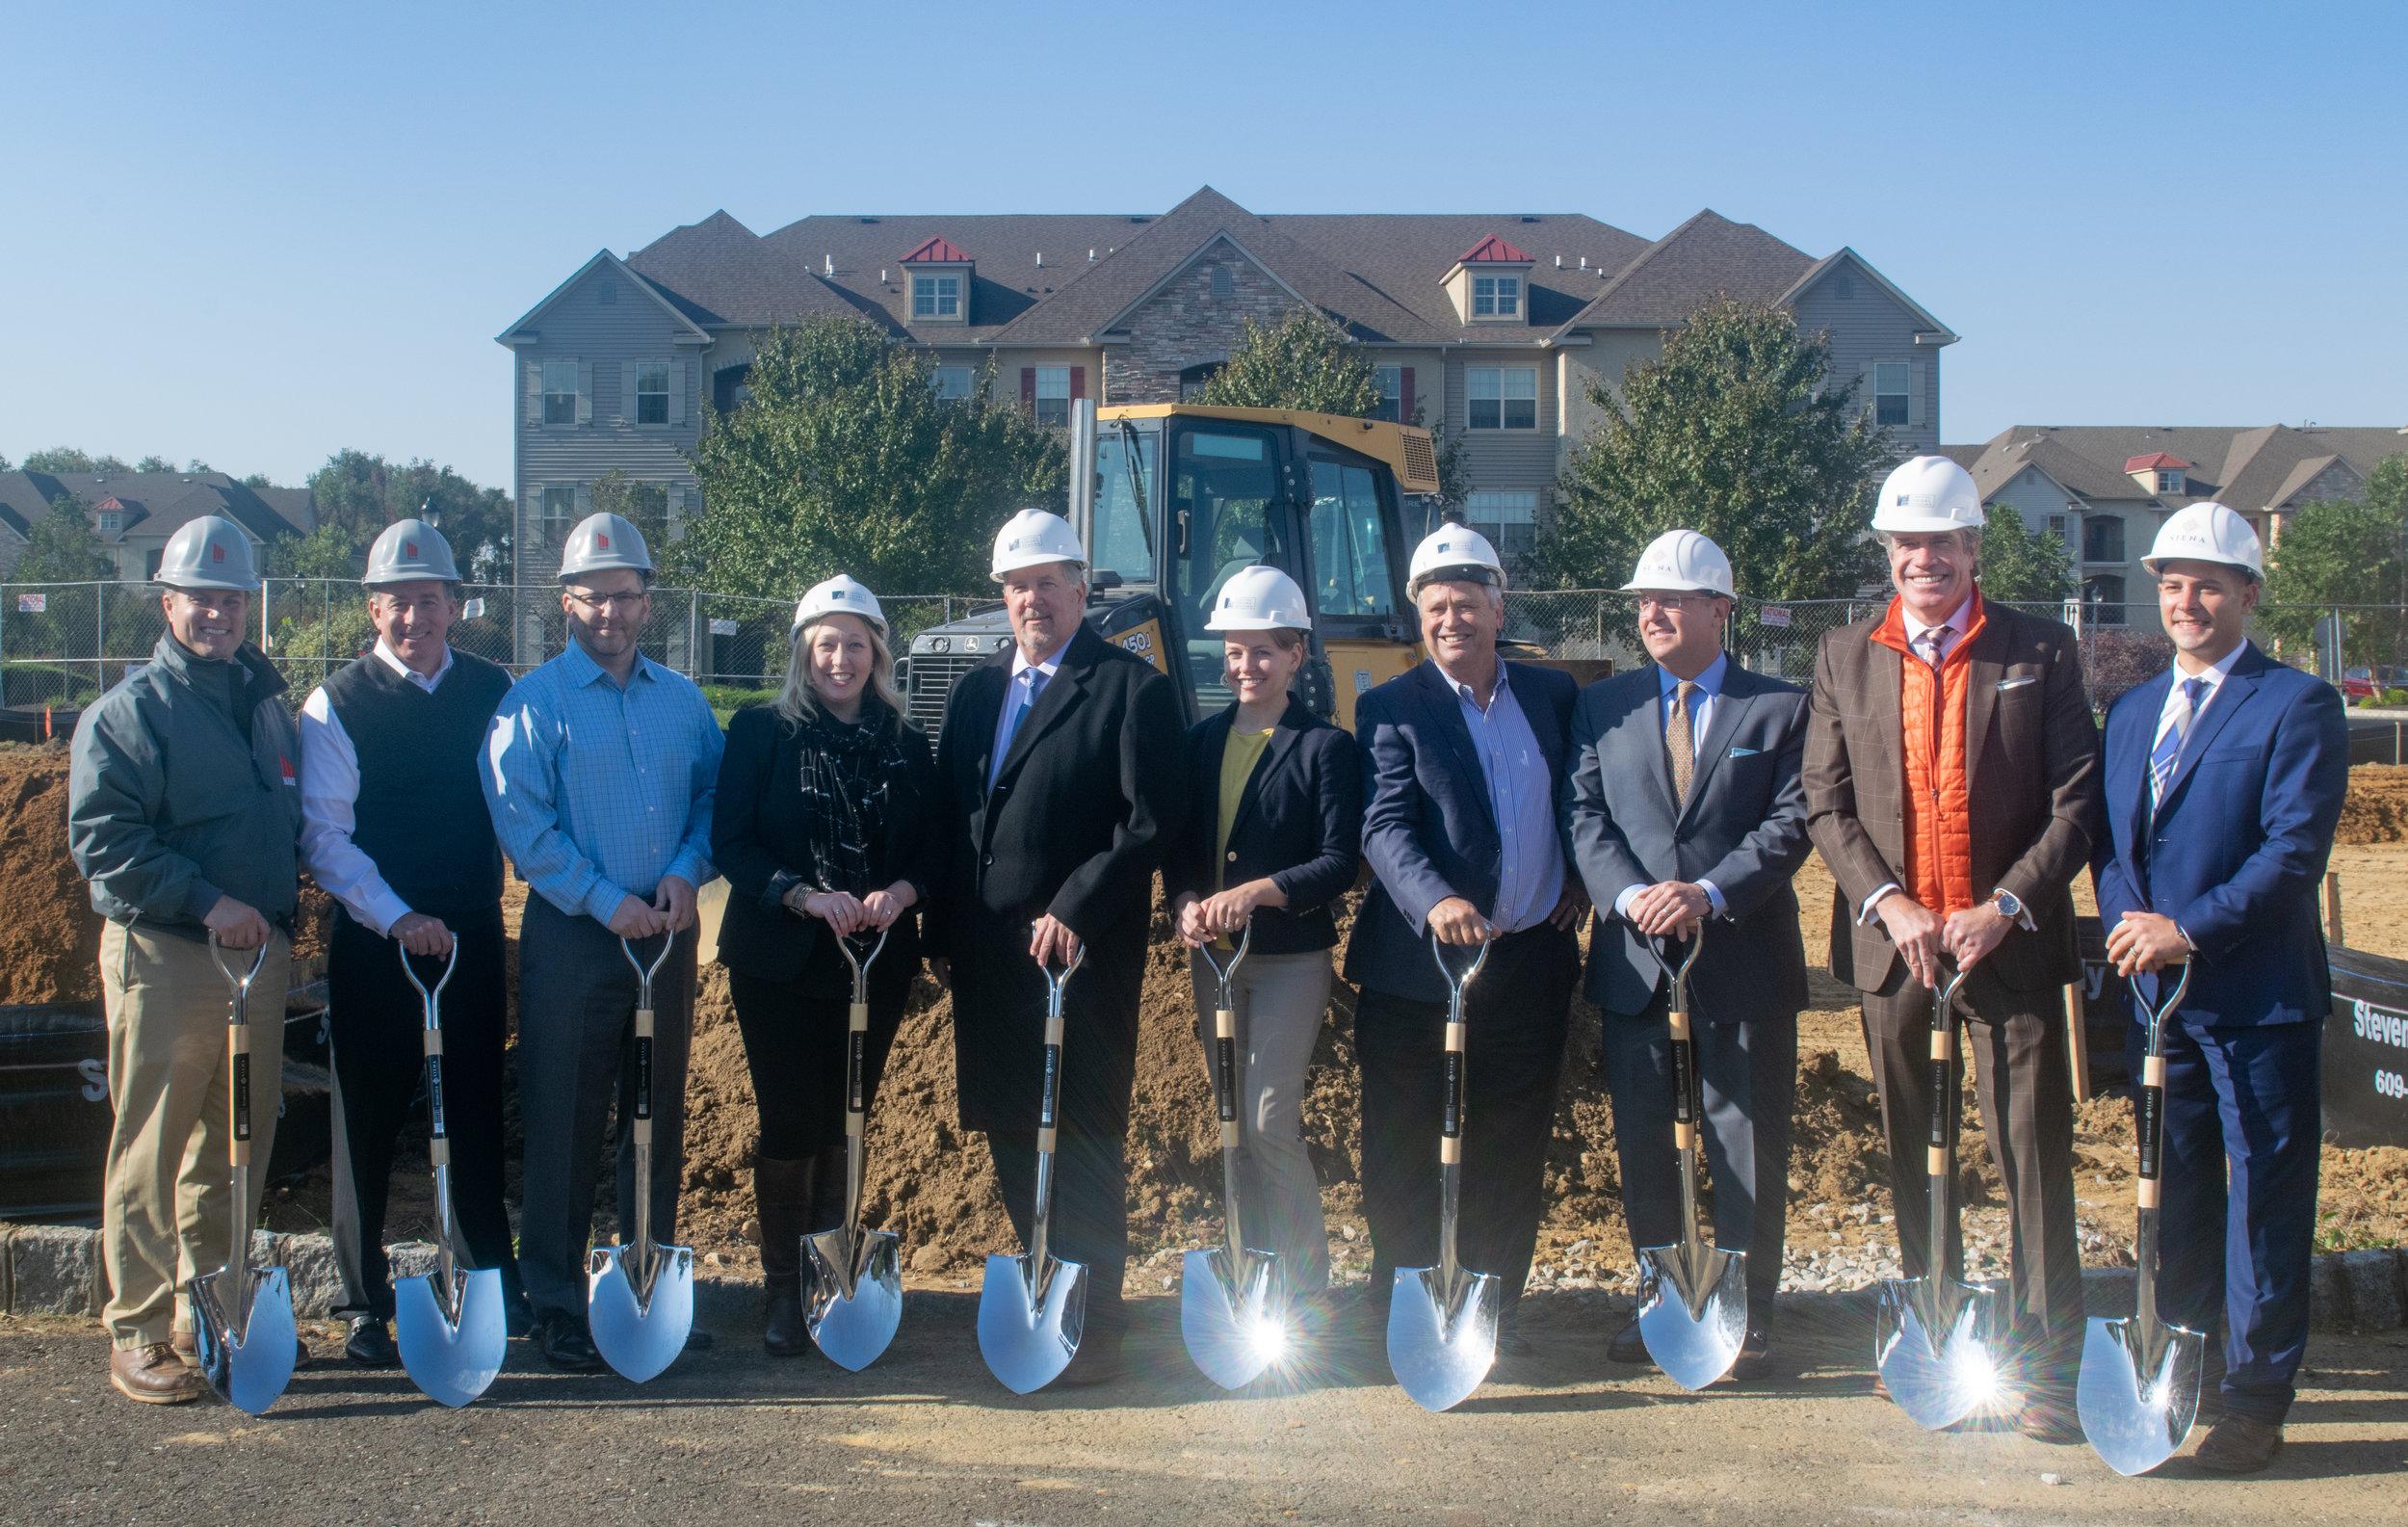 March Construction, Meyer Senior Living, Capitol Seniors Housing, & Cove